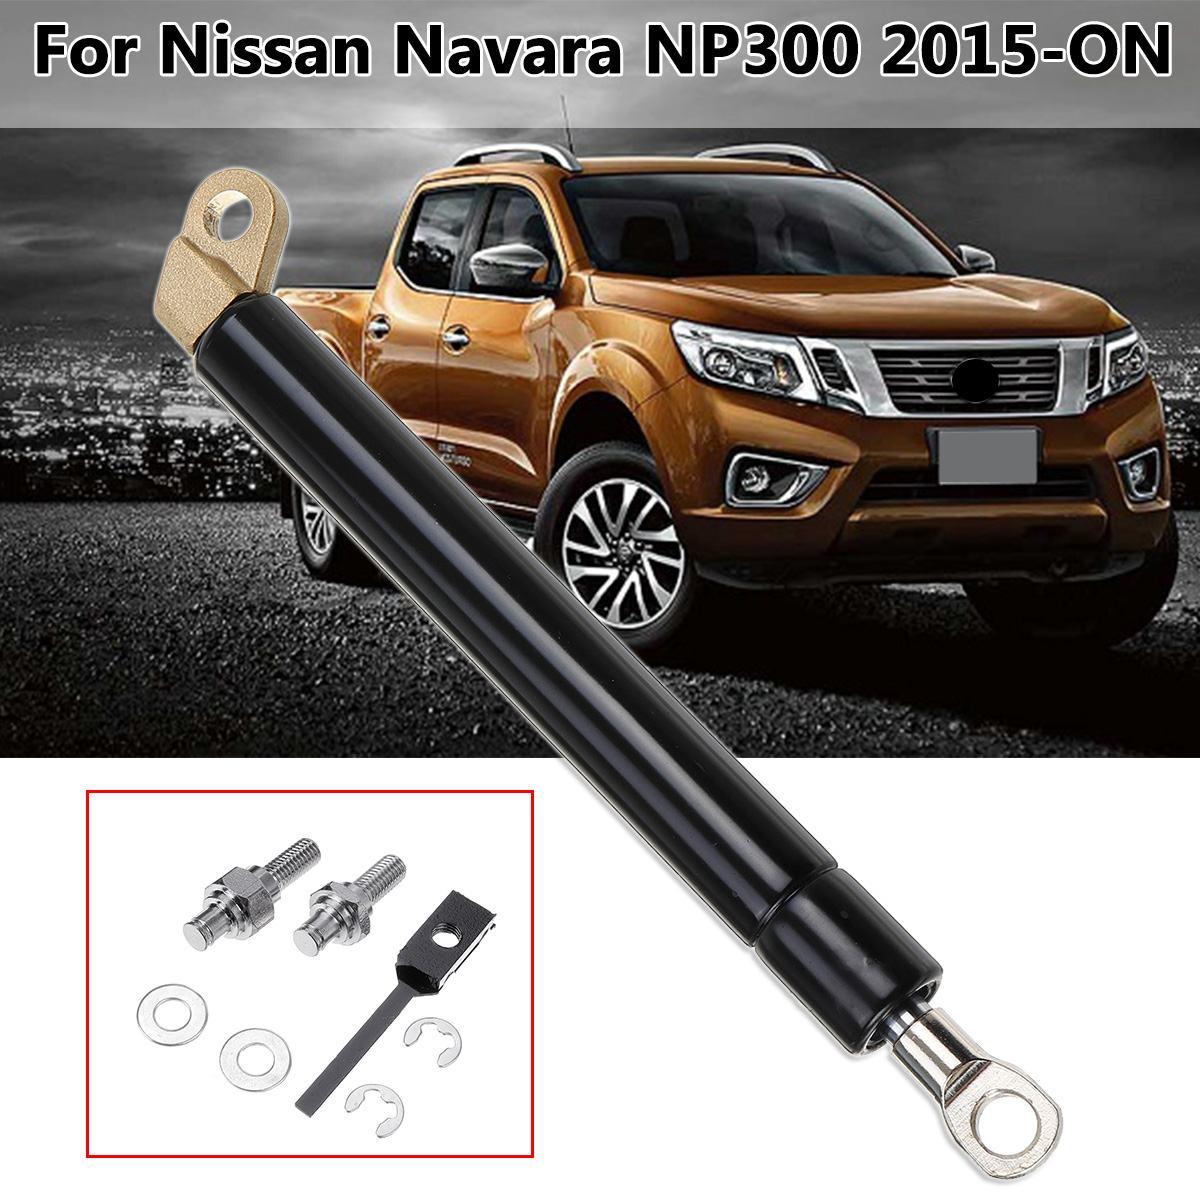 1Pcs Trunk แก๊ส Liftgate Tailgate Easy ช้าลงสำหรับ Nissan NAVARA NP300 2015-2019